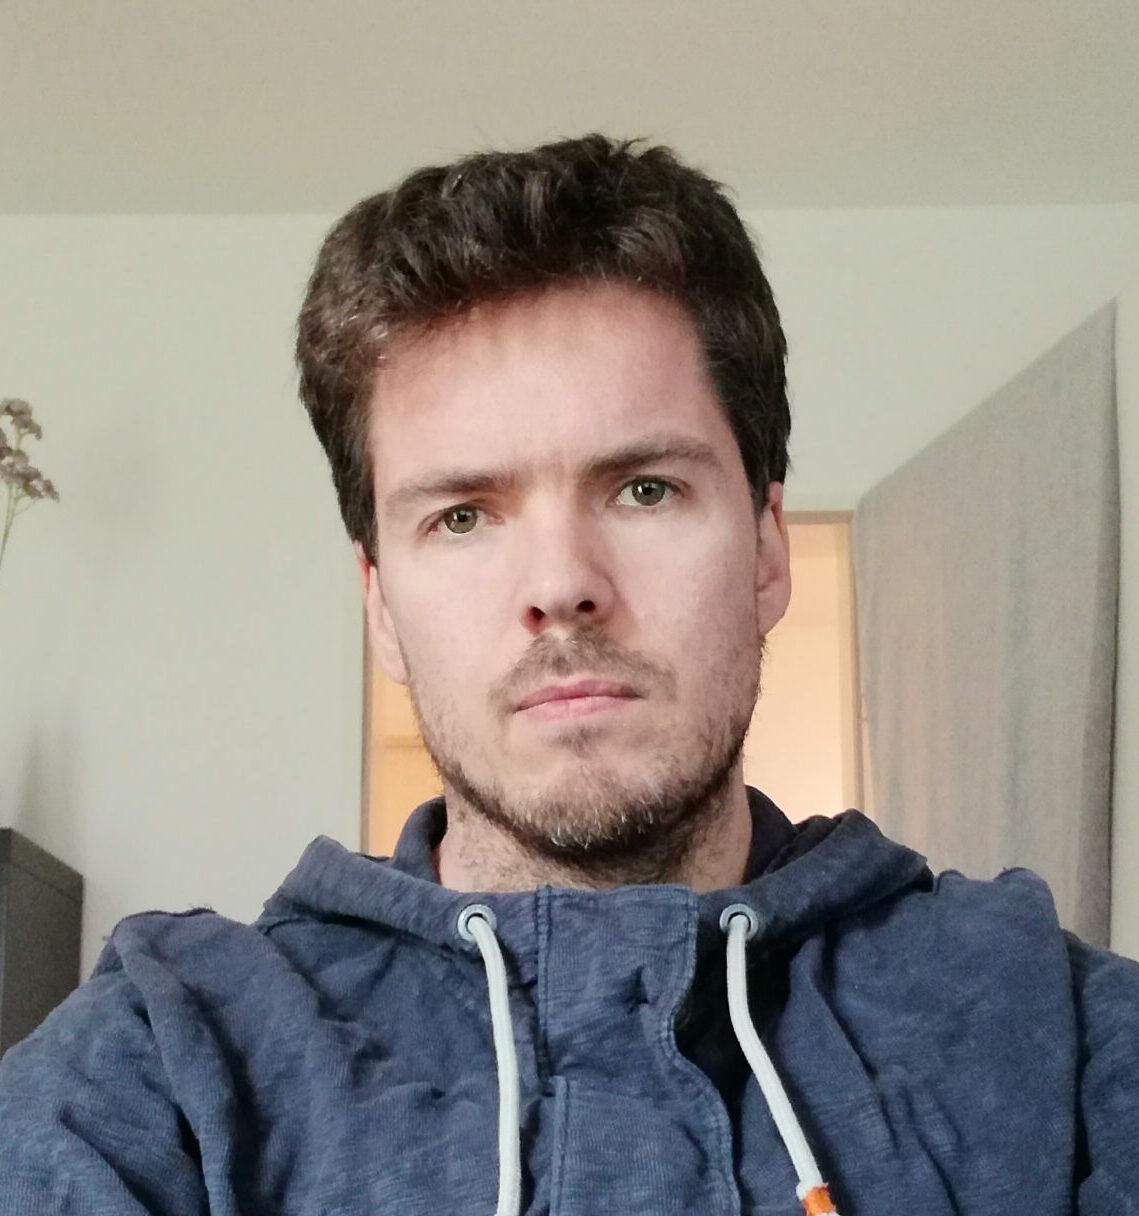 Alexander Wilke